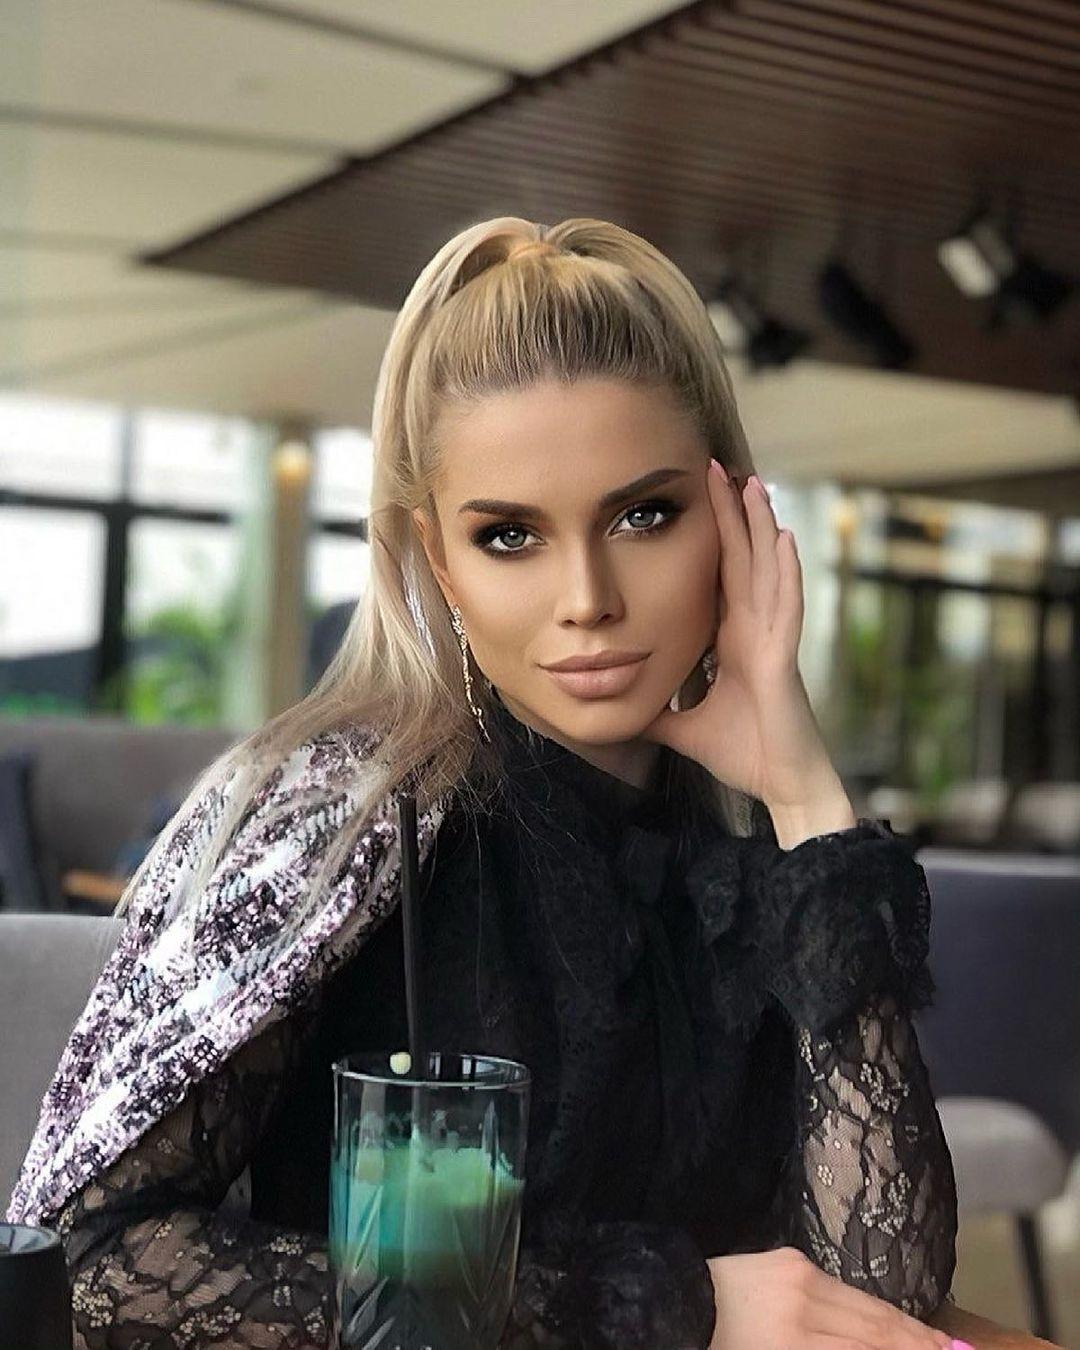 Anastasiya-Timonina-Wallpapers-Insta-Fit-Bio-11